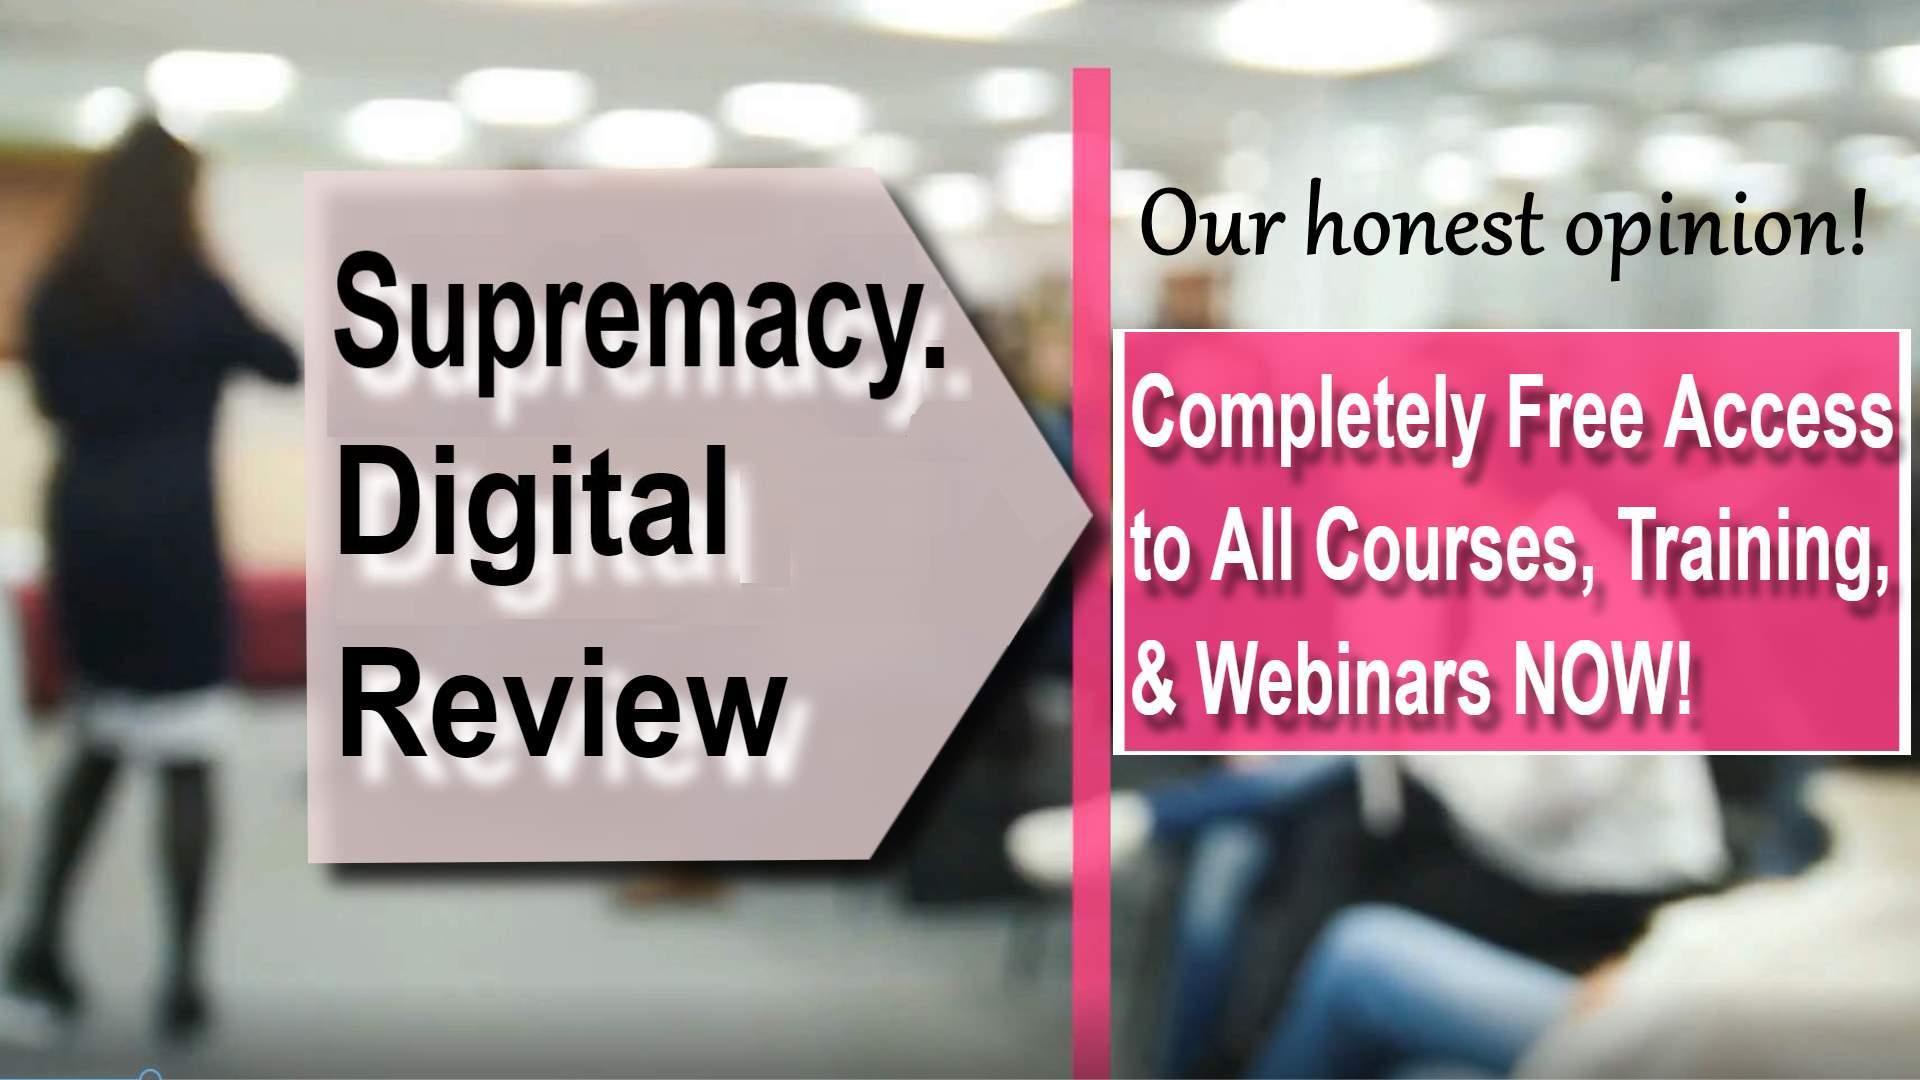 supremacy.digital review